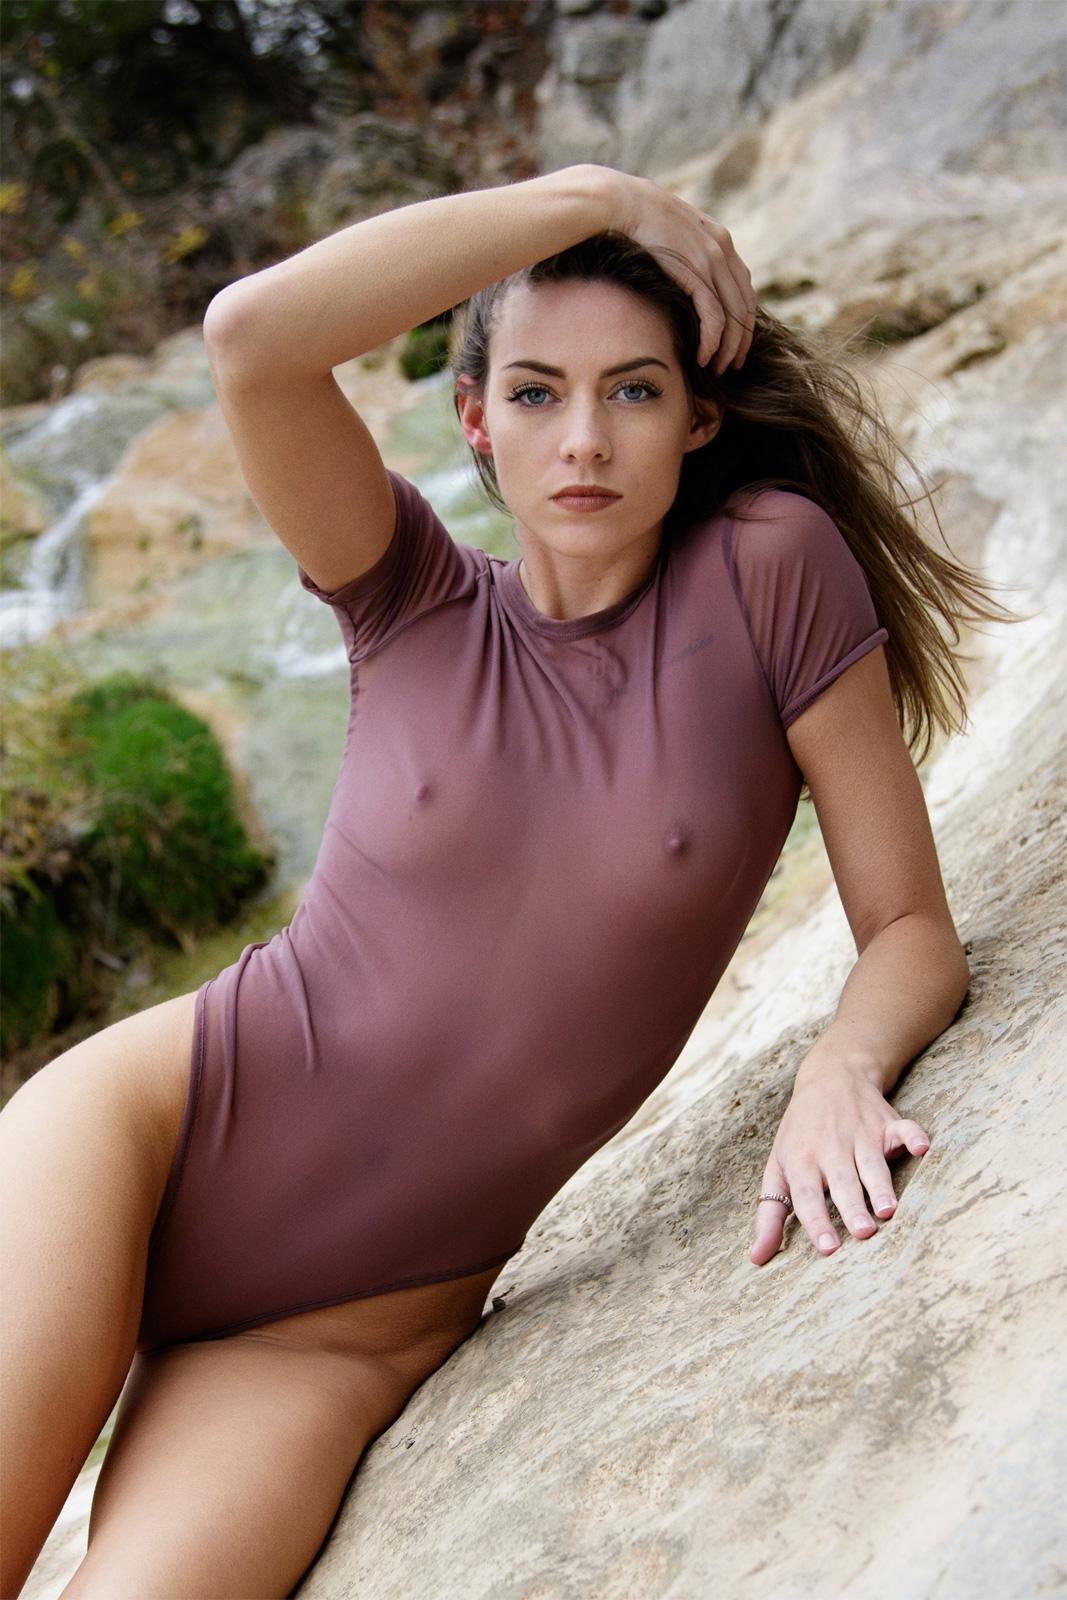 Feline Women    // lionsmag.com - premium nude photography magazine